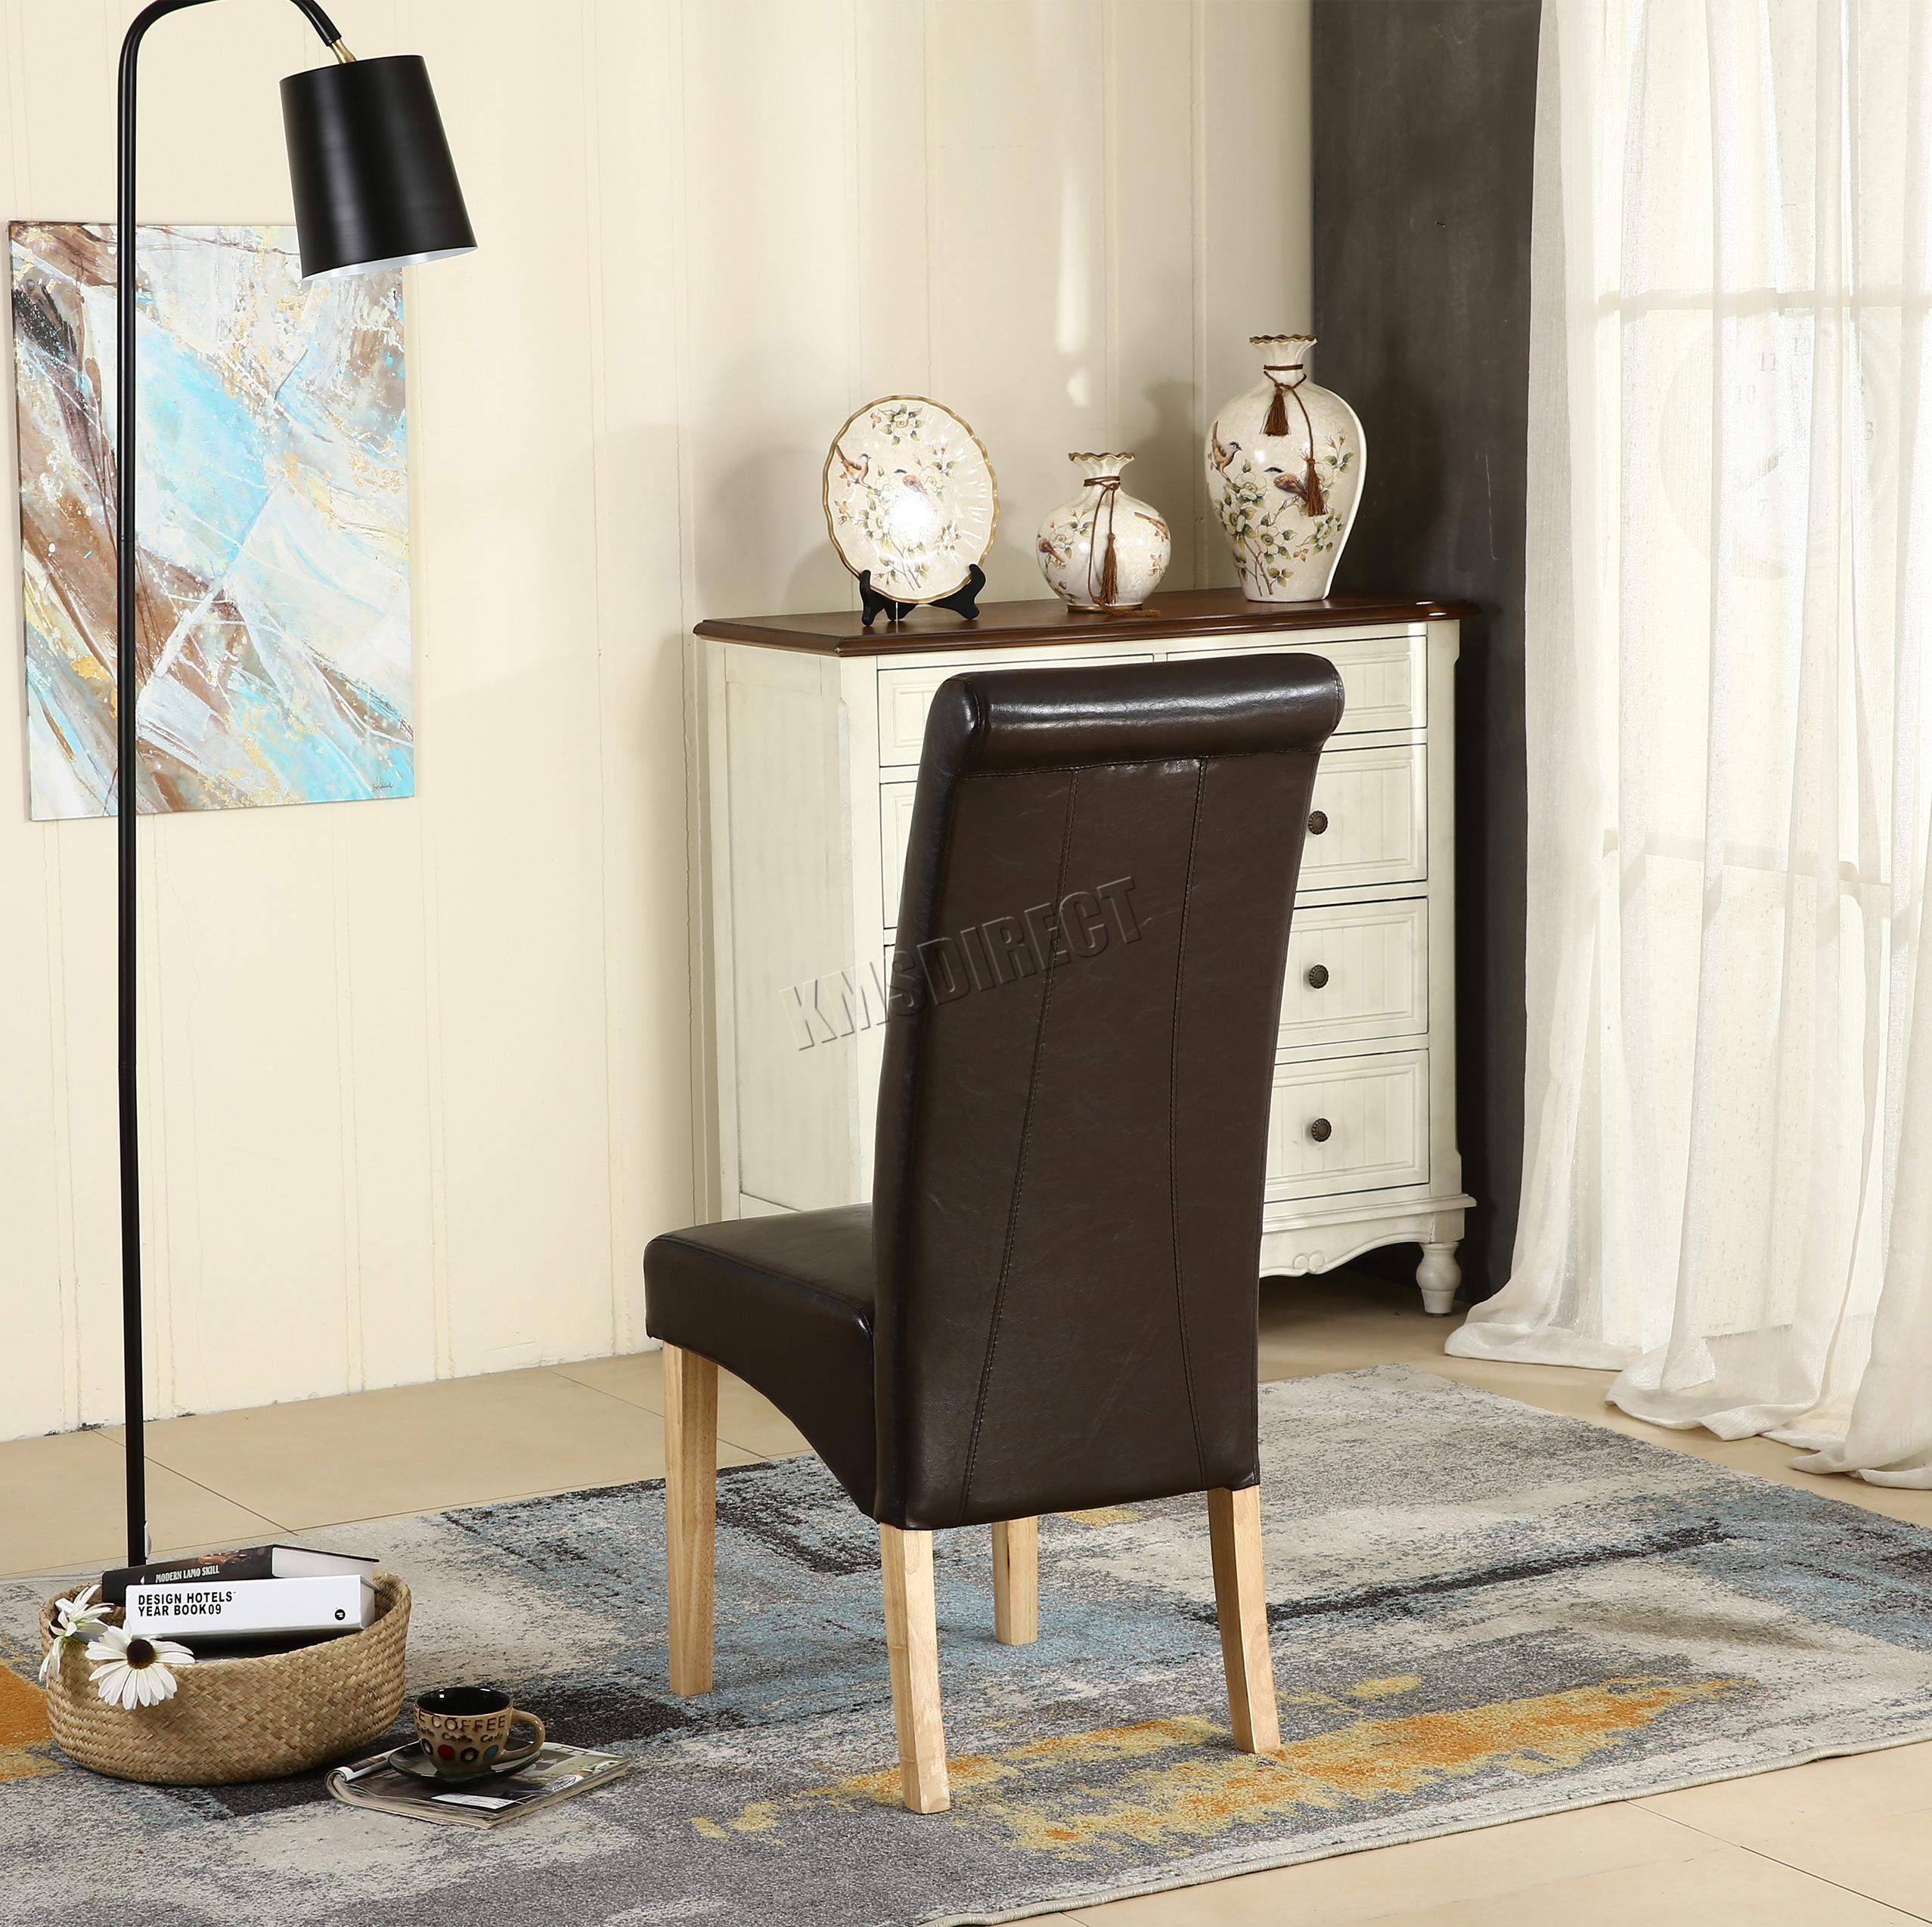 Neuf simili cuir marron chaise salle manger rouleau haut for Chaises salle manger cuir dossier haut